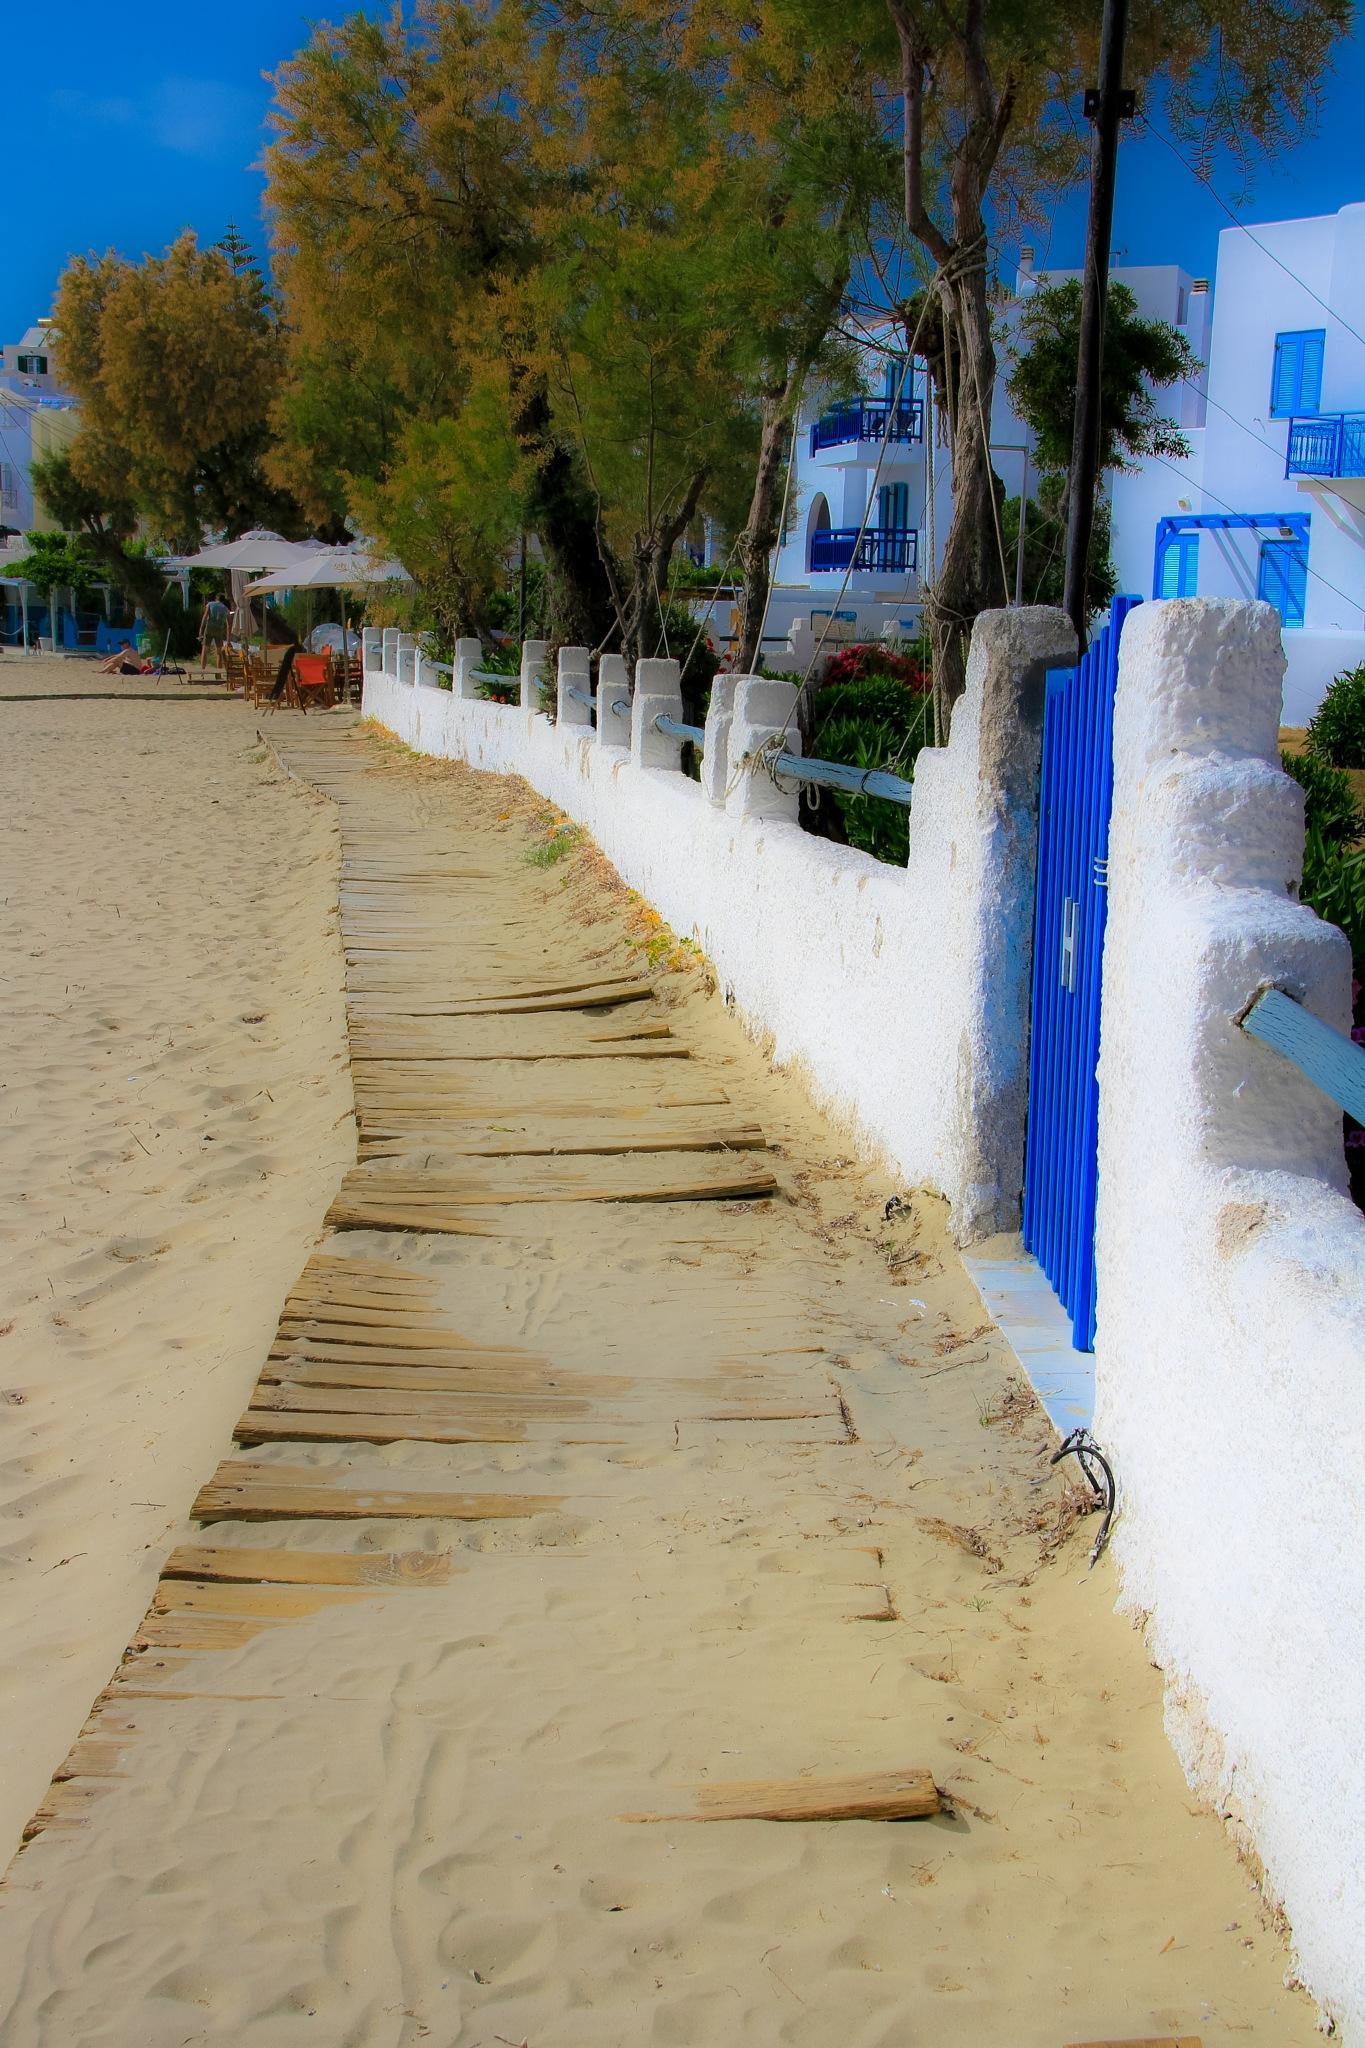 Old Boardwalk by Martin Roper